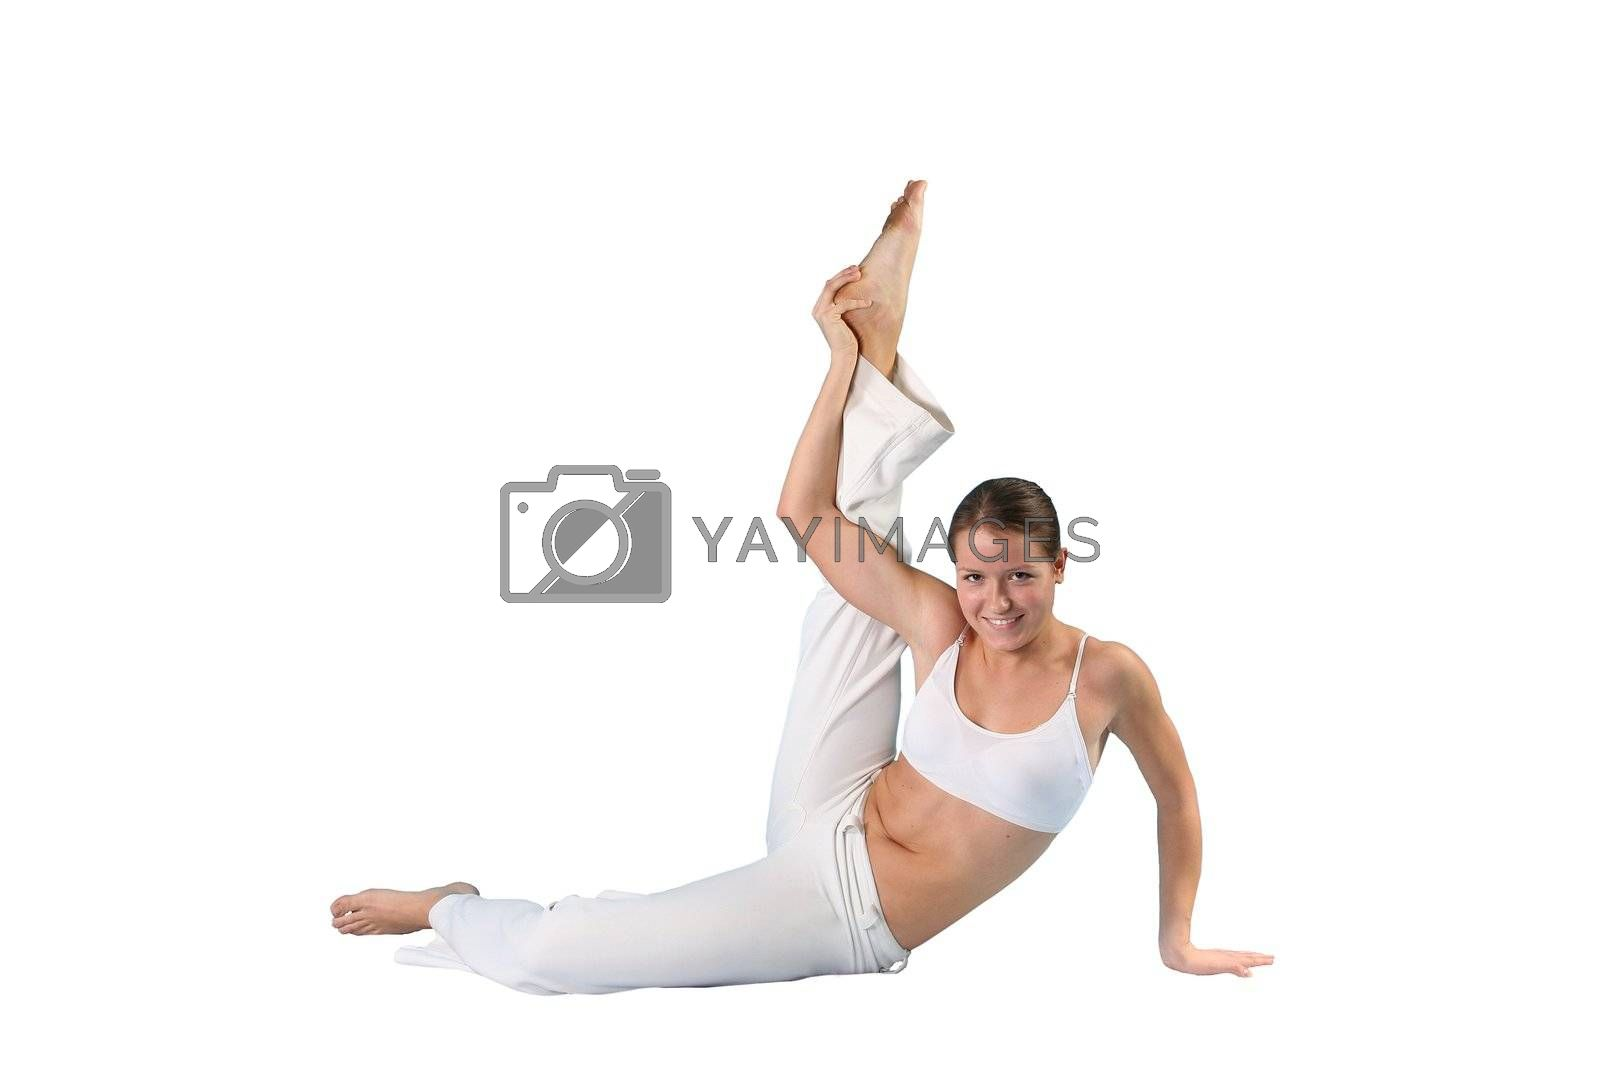 model instructor professional portraits pilates beauty slim